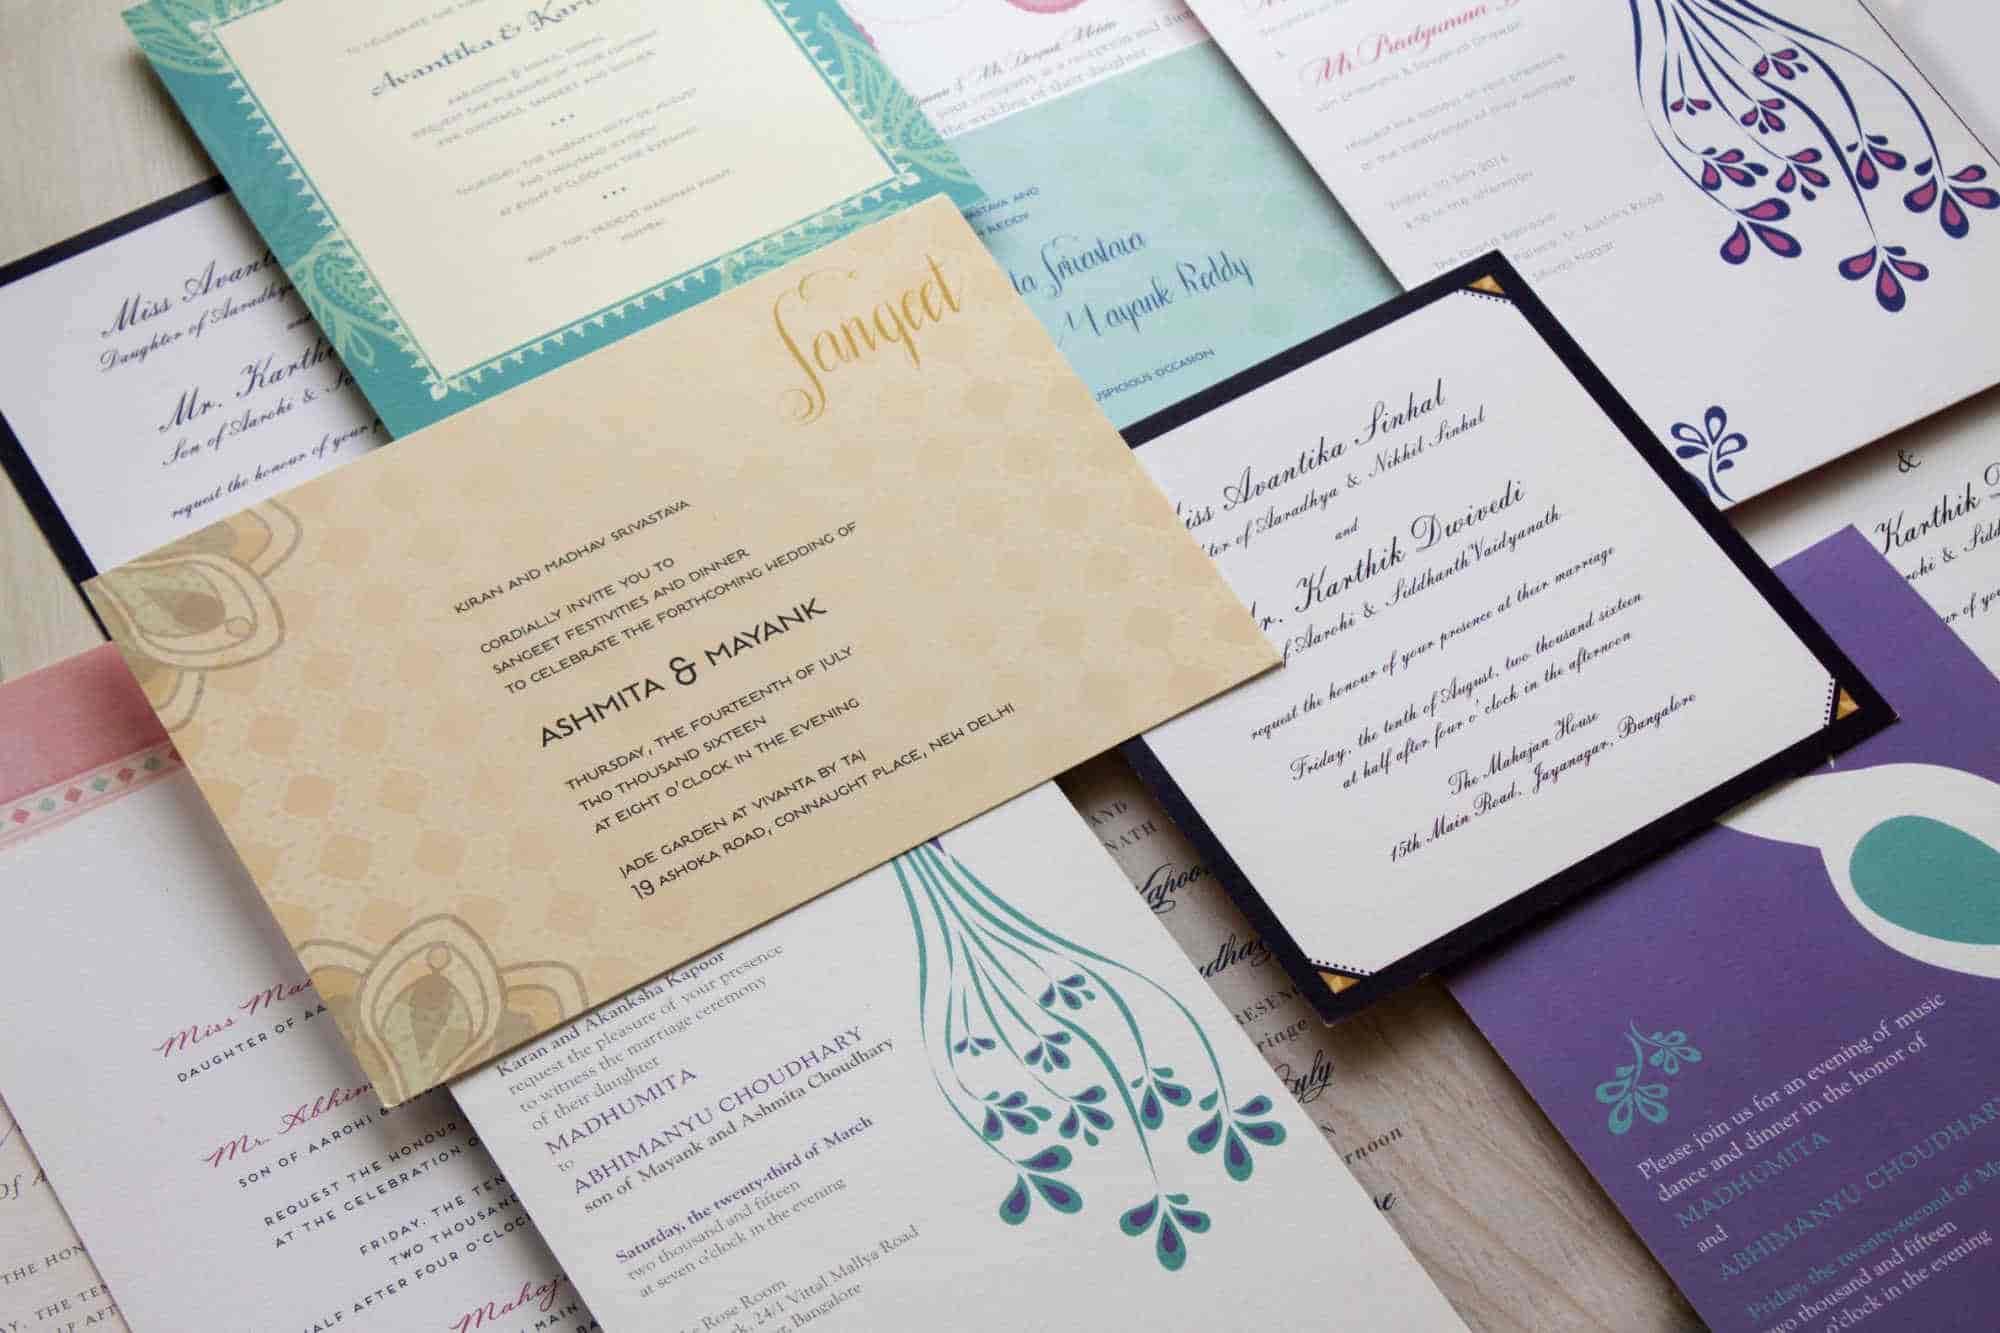 Inksedge infotech jayanagar wedding card printers in bangalore inksedge infotech jayanagar wedding card printers in bangalore justdial stopboris Image collections